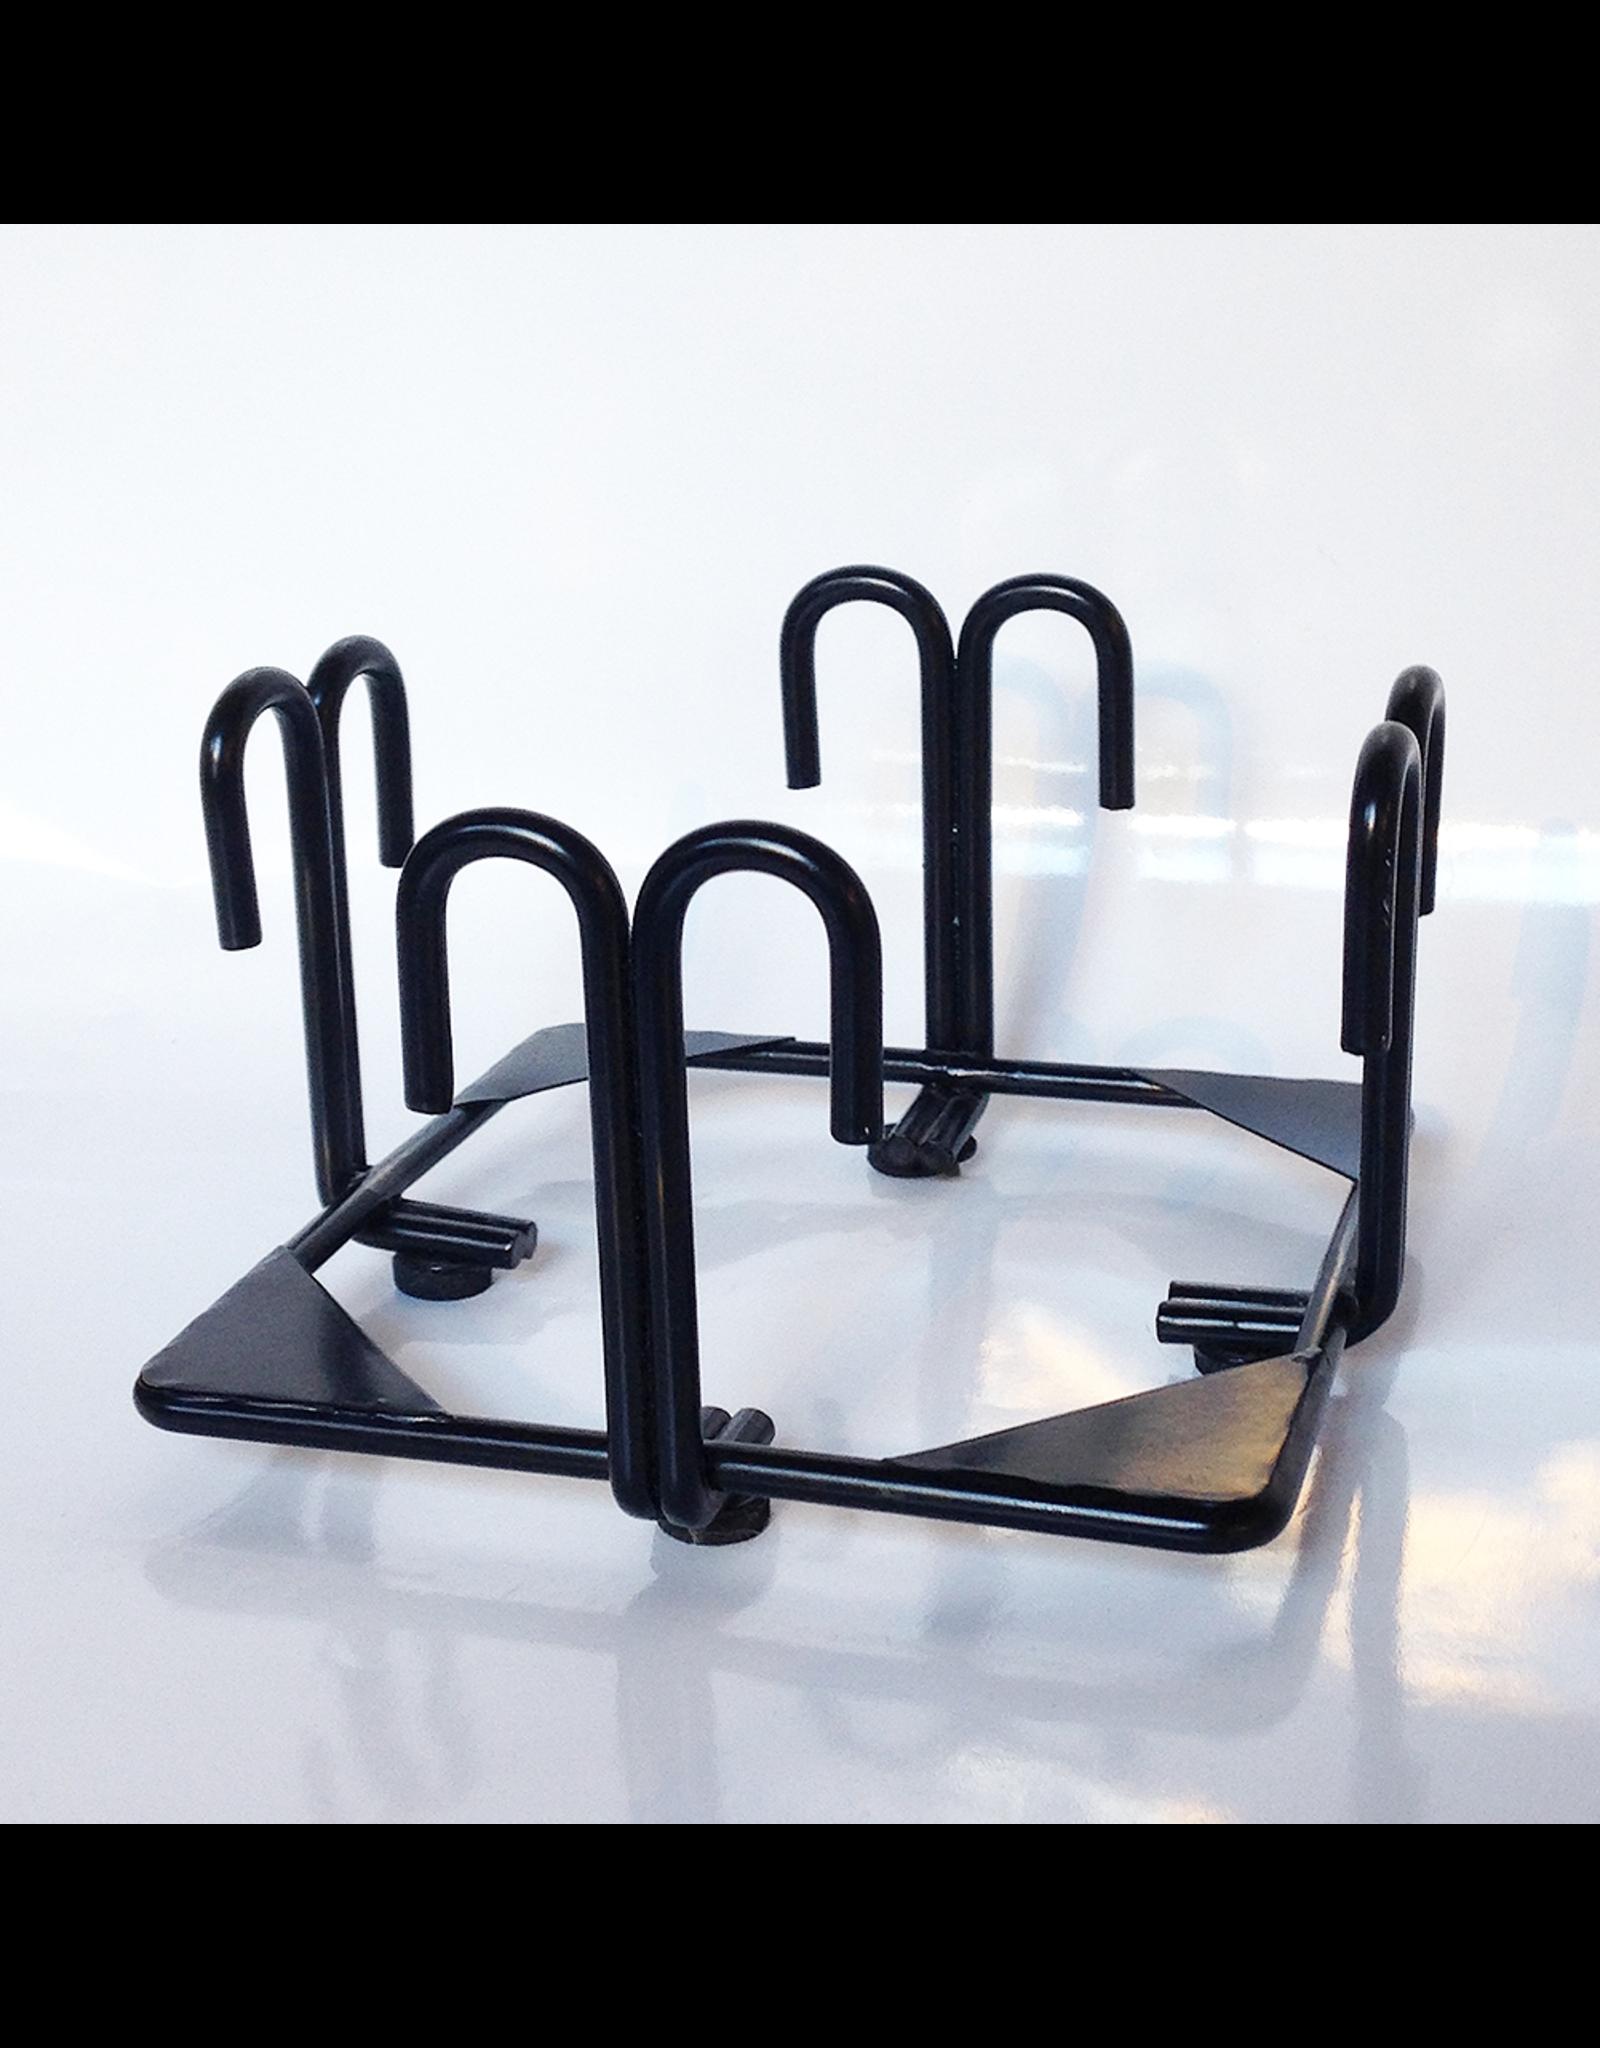 Digs Black Metal Coaster Holder 4x4